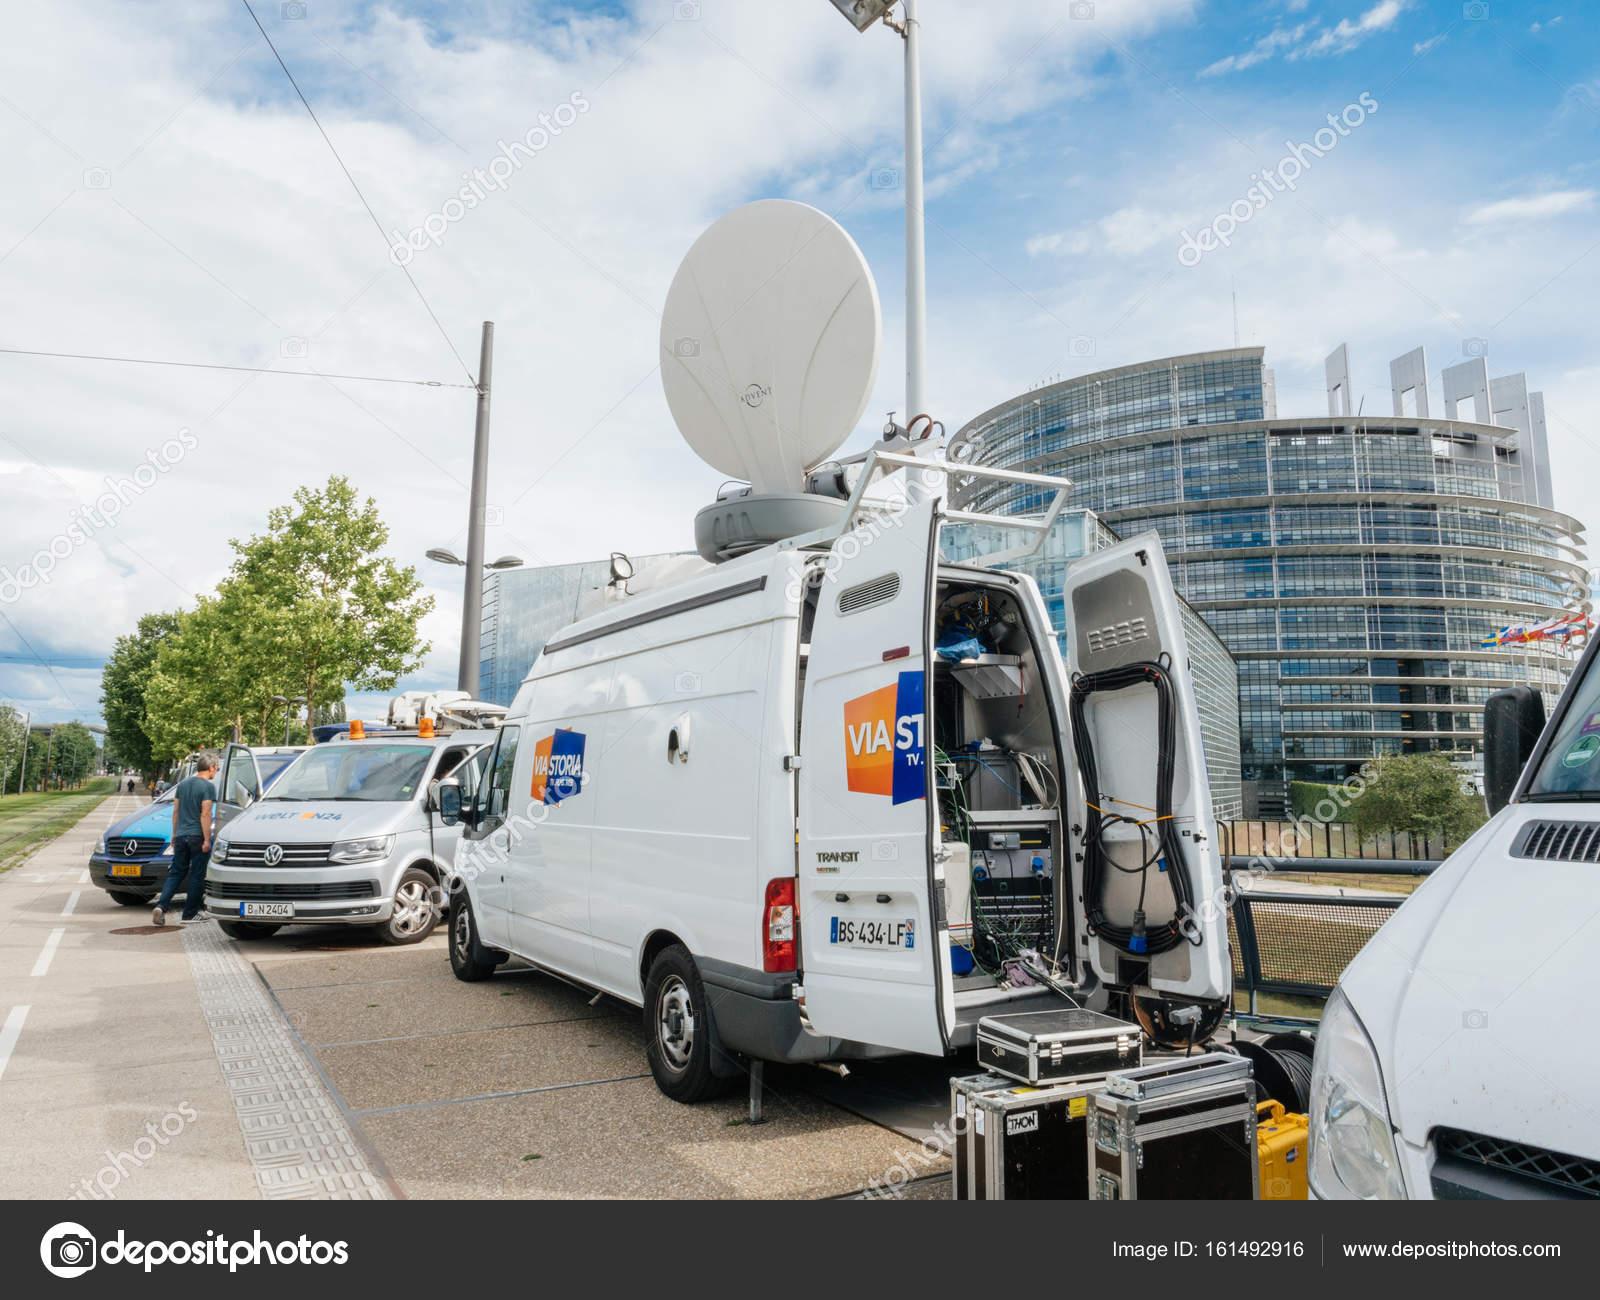 Engineer near Media TV truck van parked in front of